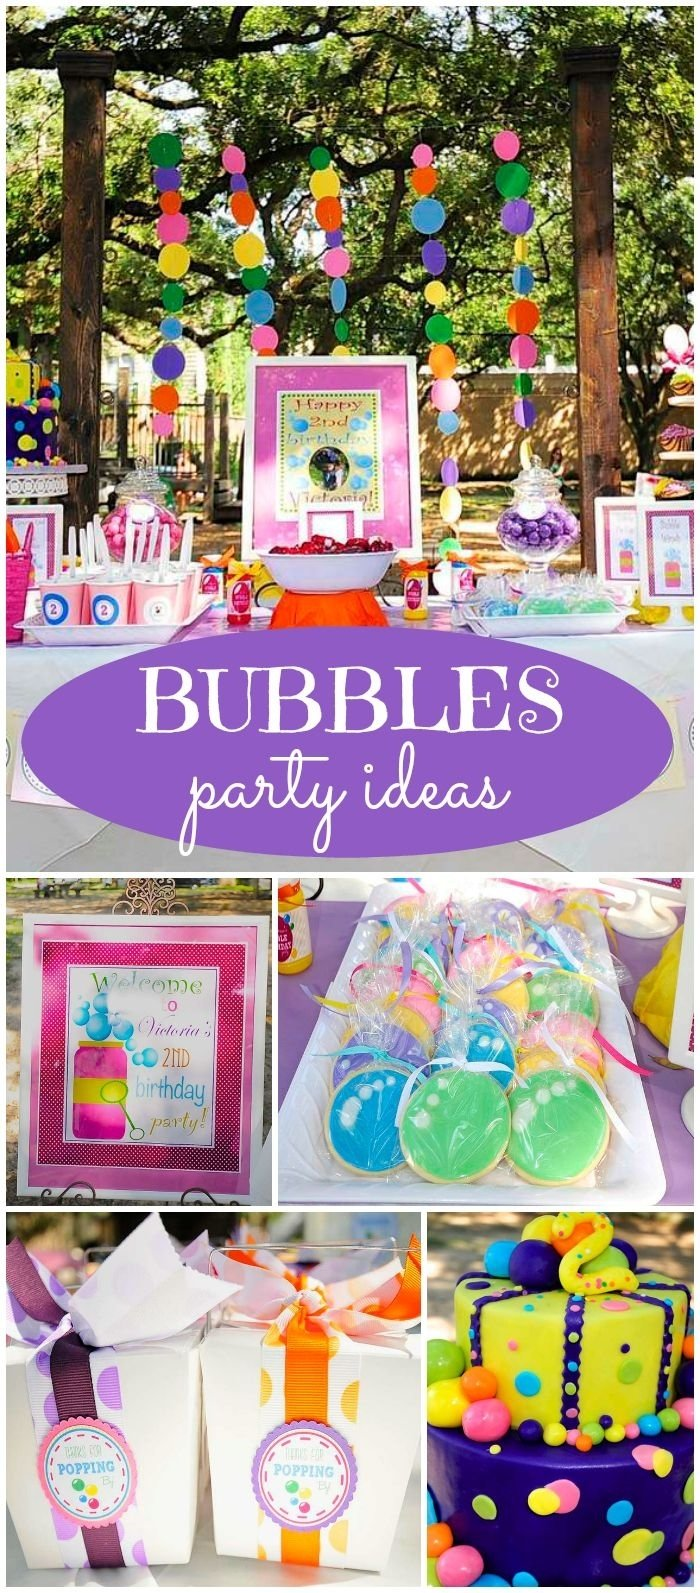 10 Stylish Little Boy Birthday Party Ideas 2nd Themes Tags